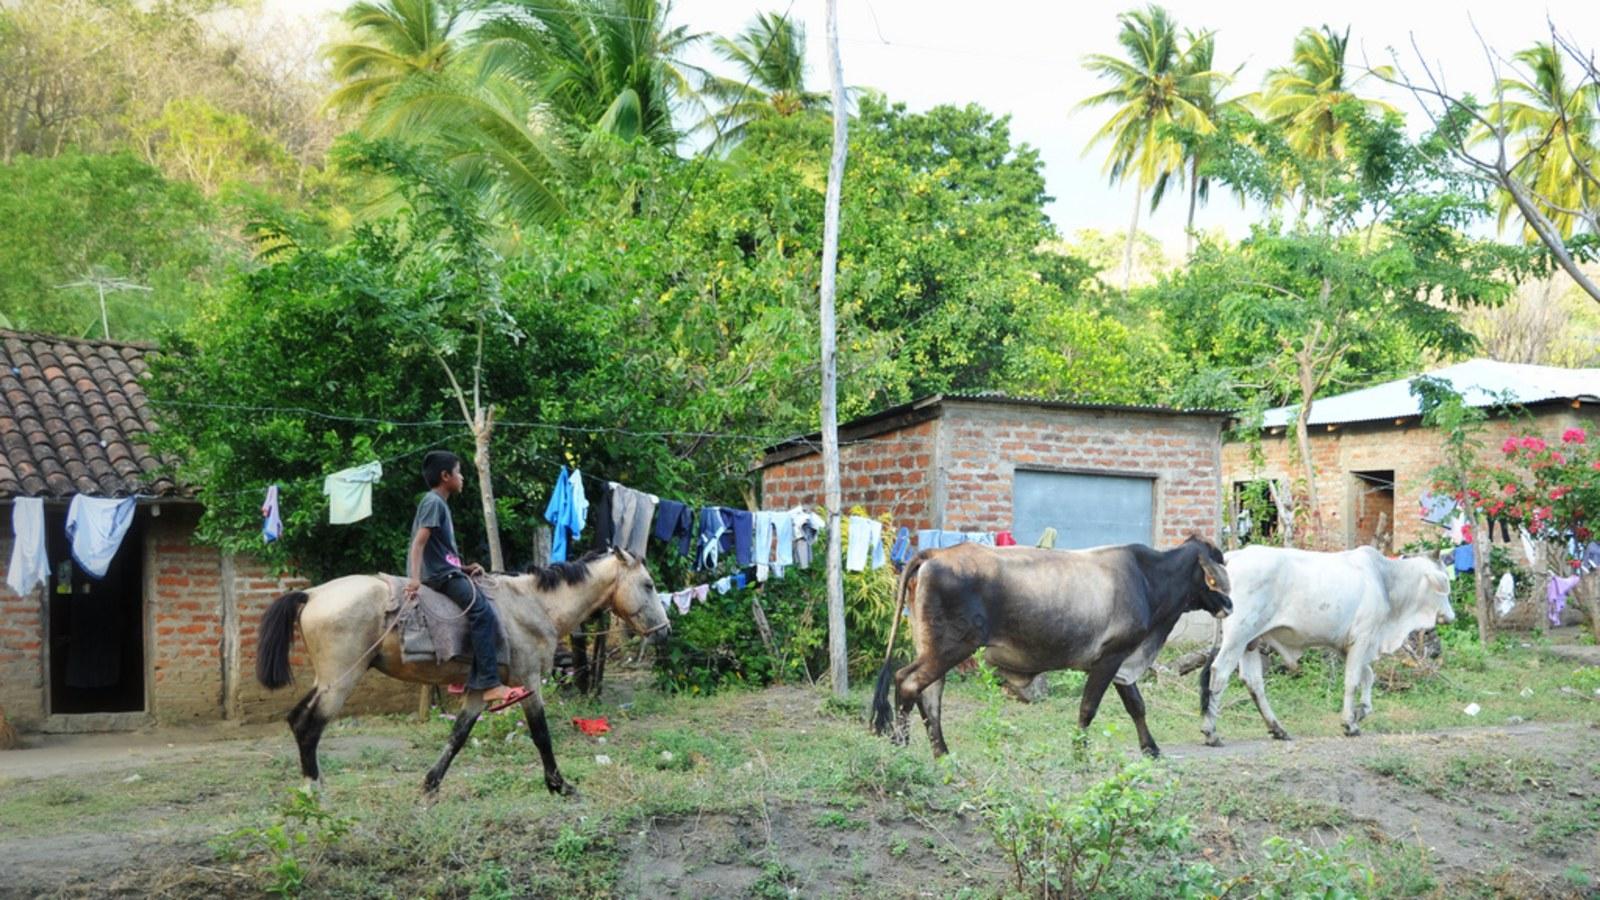 chevaux-dans-les-rues-d-ometepe-nicaragua-1456343358.jpg